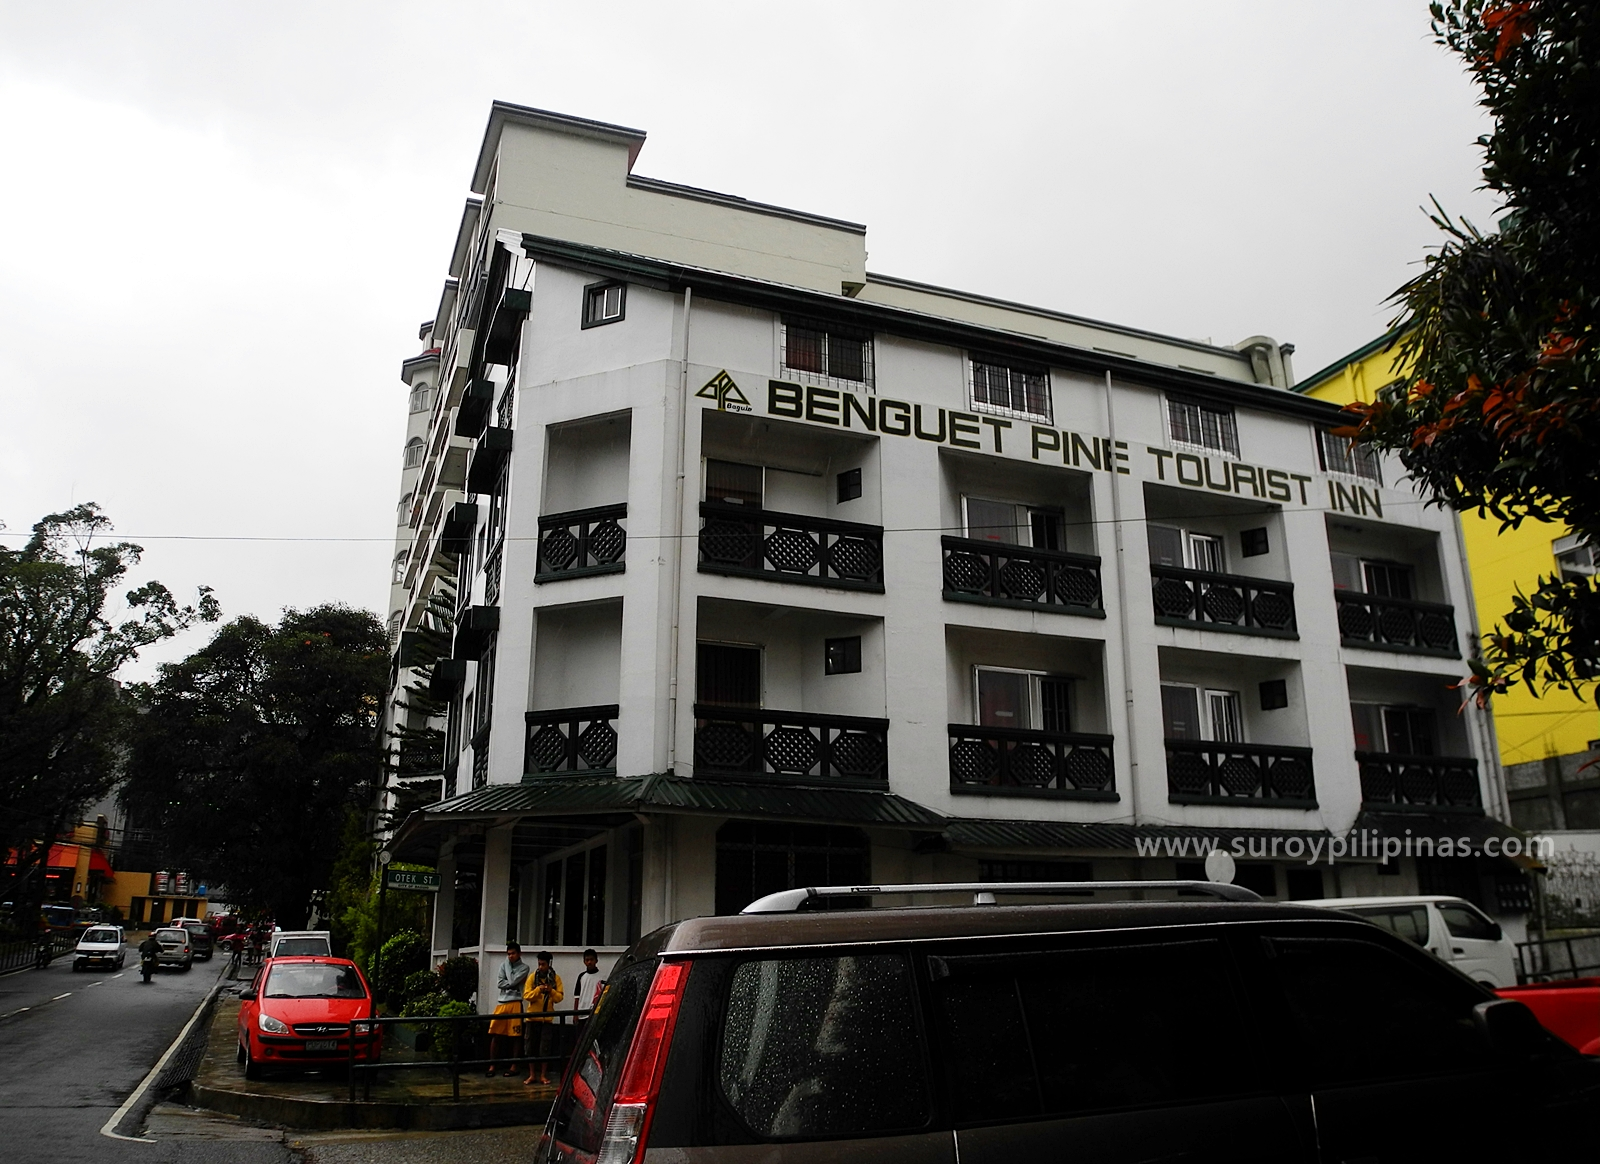 Review Benguet Pine Tourist Inn In Baguio City